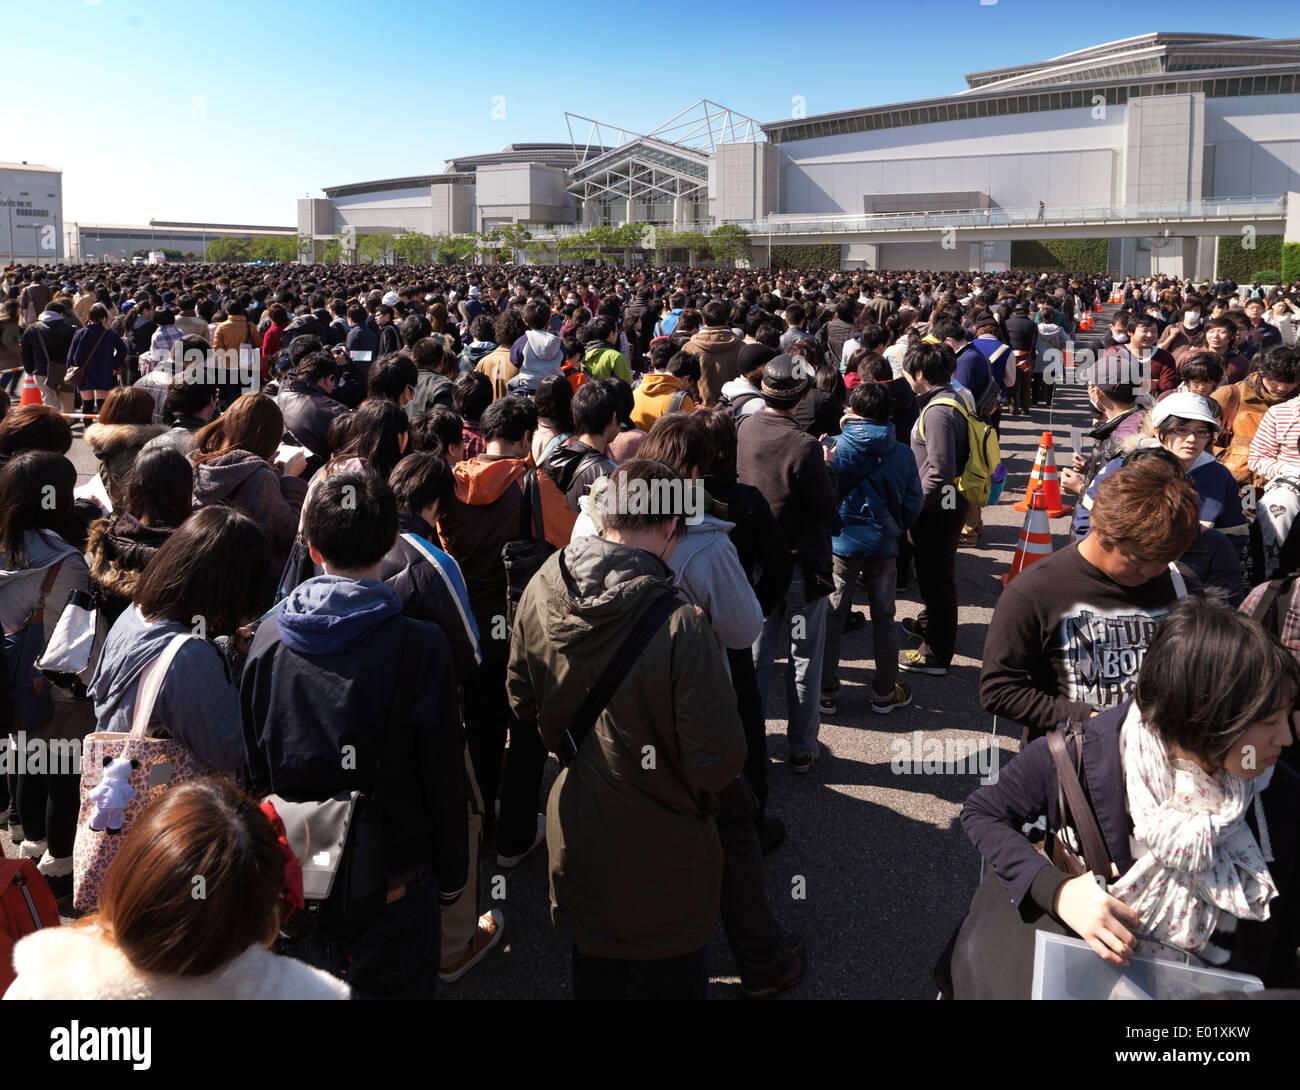 Larga fila de gente en Tokio Big Sight Exhibition Centre durante AnimeJapan Tokyo International Anime Fair. Tokio, Japón. Imagen De Stock